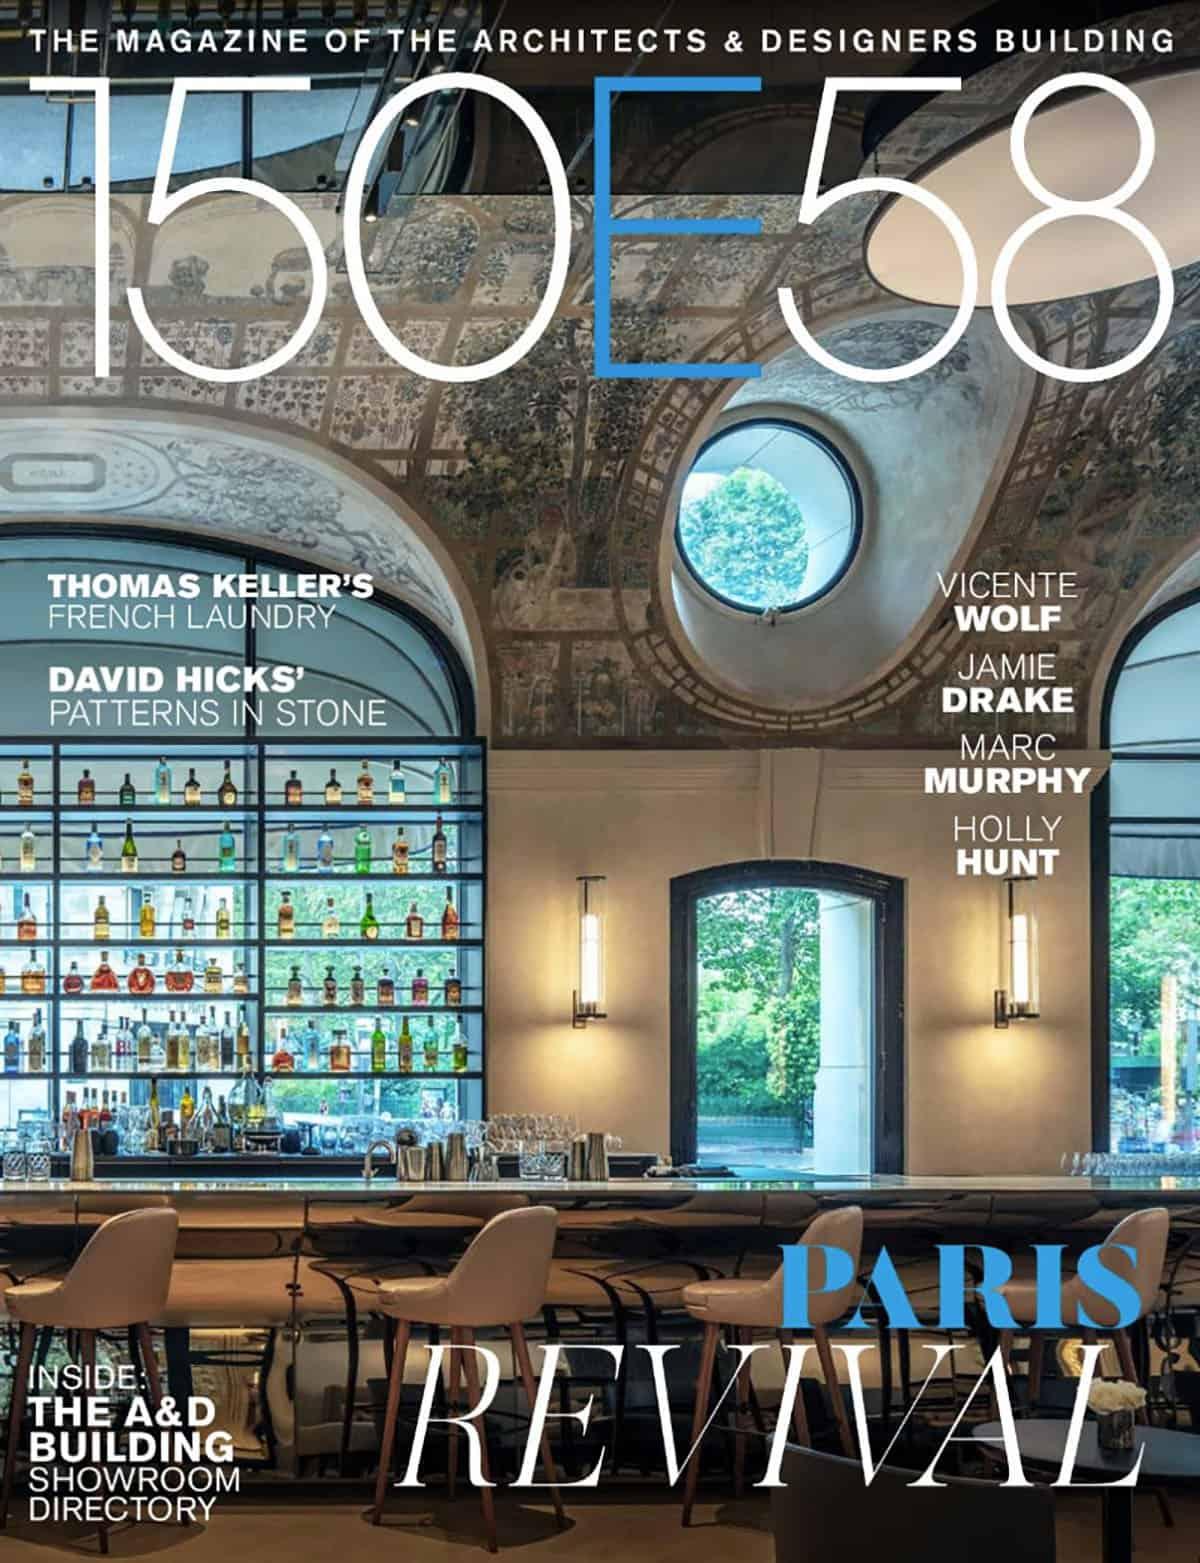 eggersmann featured in A&D building's magazine